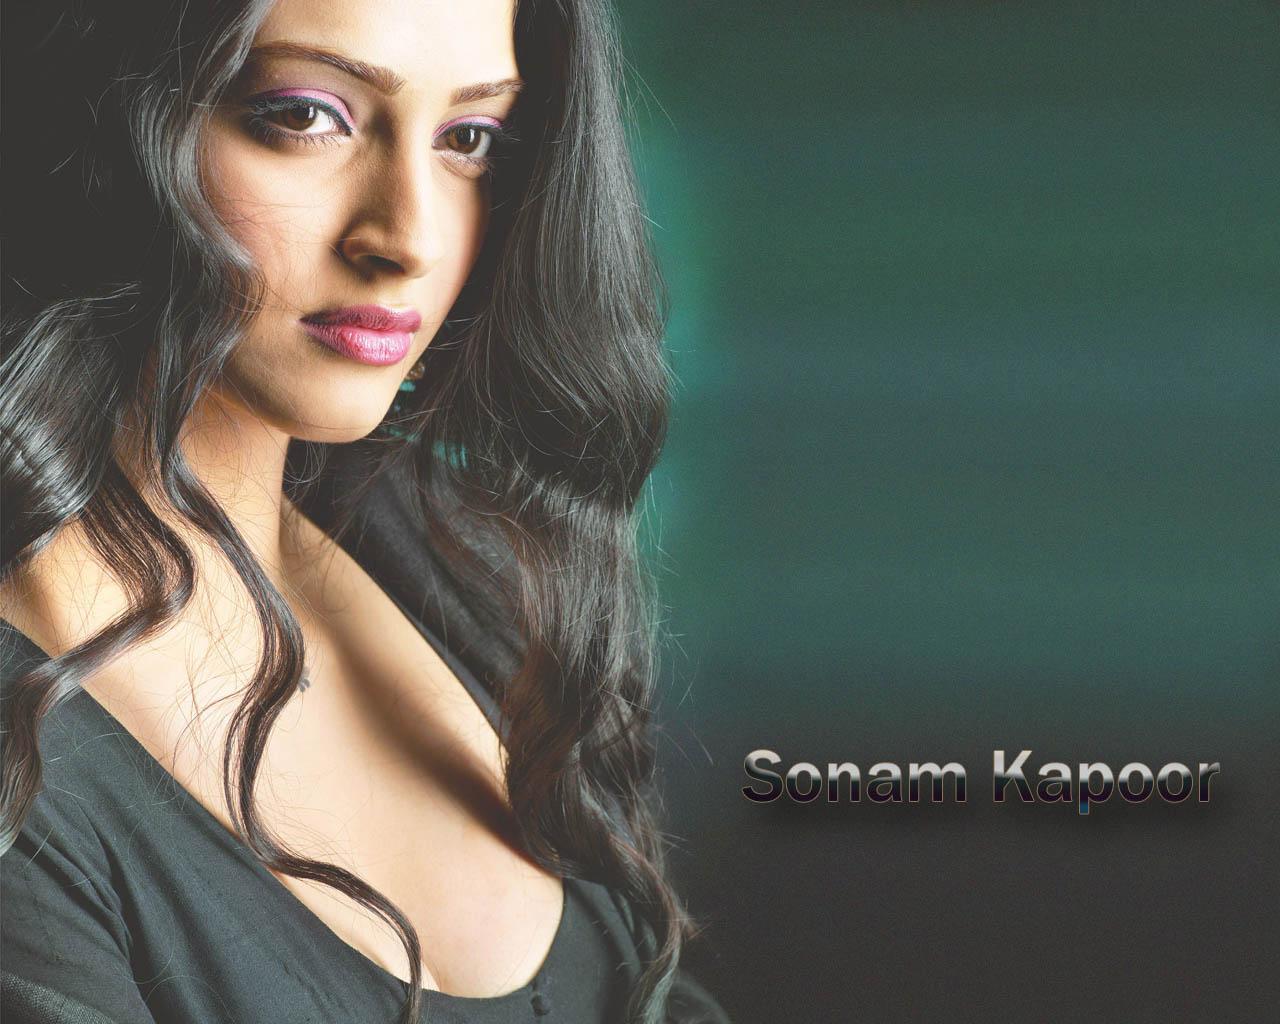 http://1.bp.blogspot.com/-j_2LbBnm5pw/TwHmb1BOqvI/AAAAAAAAMl4/LQifpUeIF_o/s1600/Sonam_Kapoor_Smile_Hd_Wallpapers_big_size.jpg